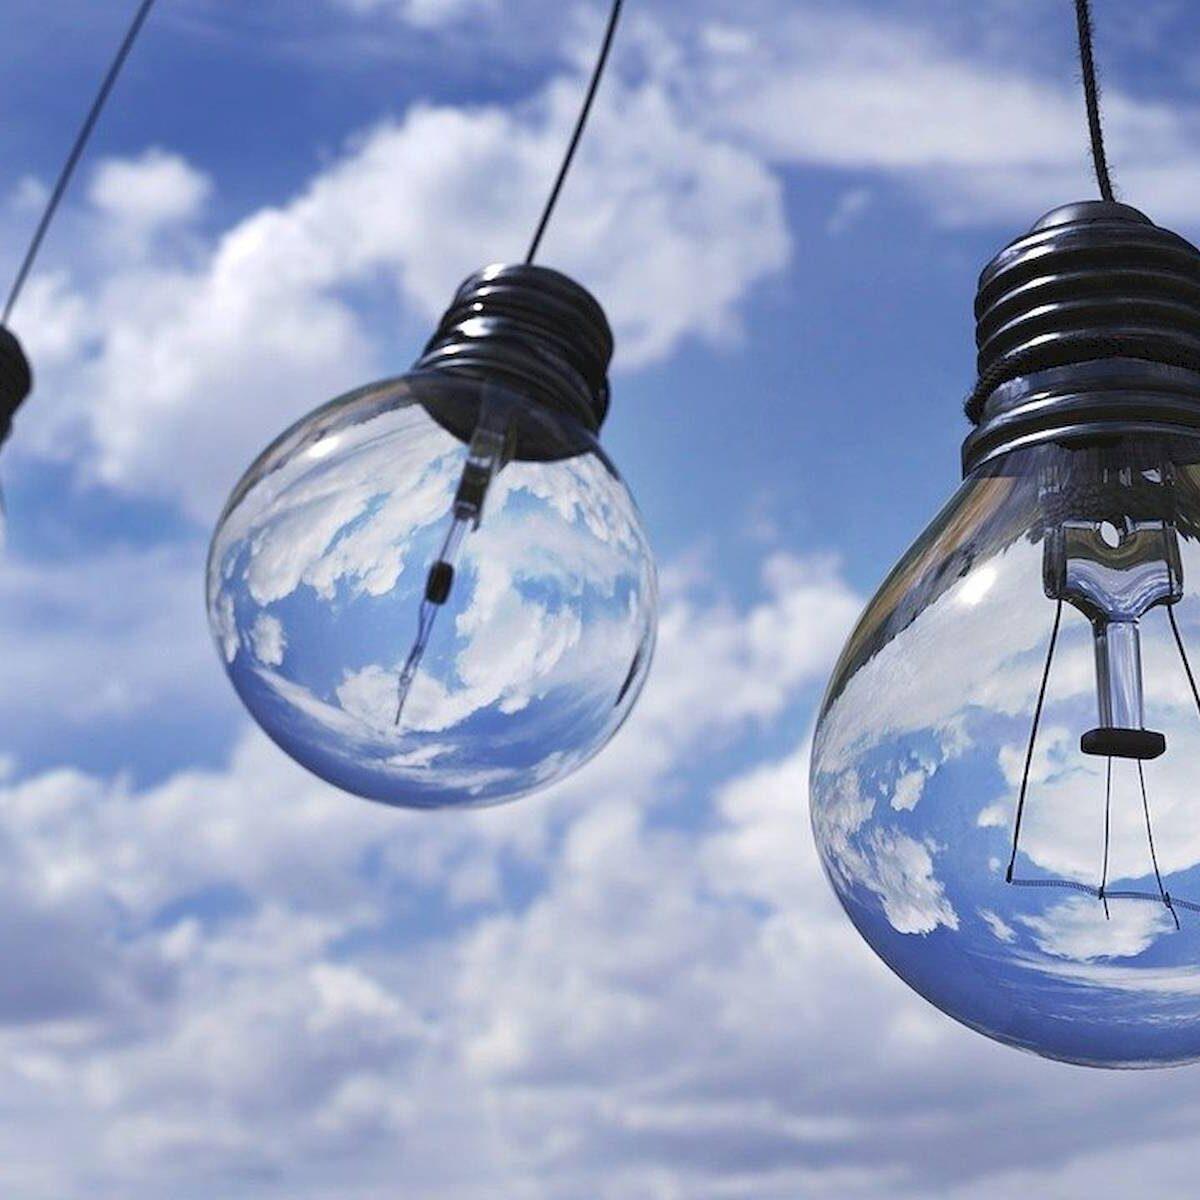 25 Haziran Cuma elektrik kesintisi İstanbul! Anadolu yakası elektrik kesinti sorgulama